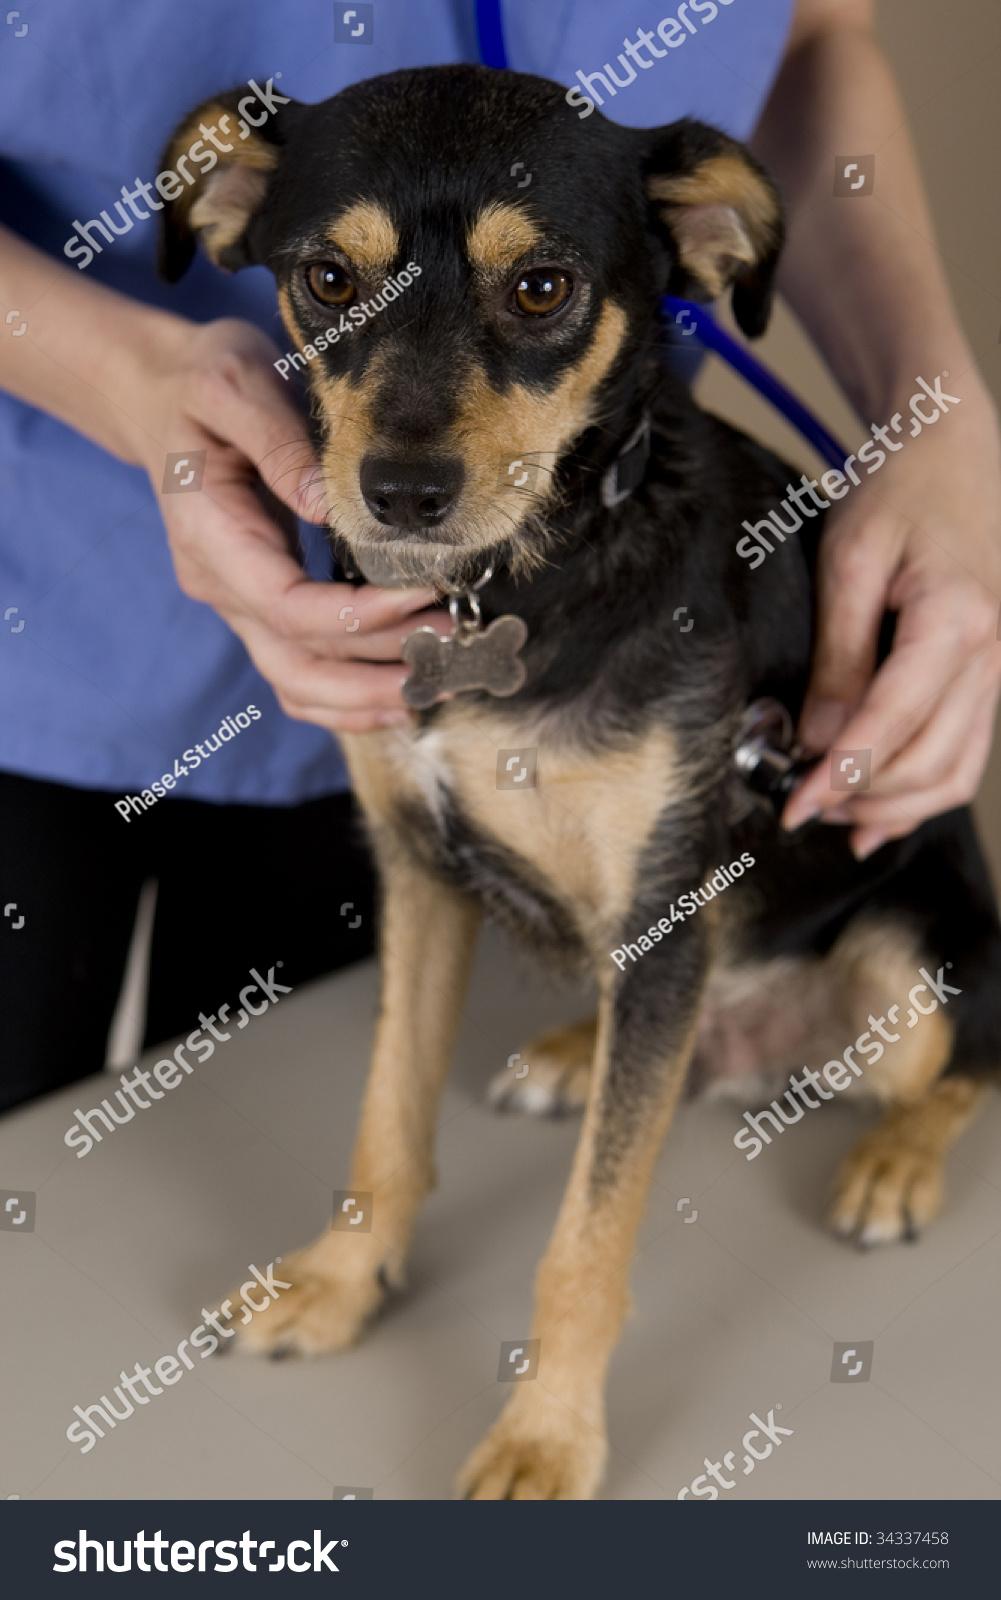 Dog Getting Examination Stock Photos